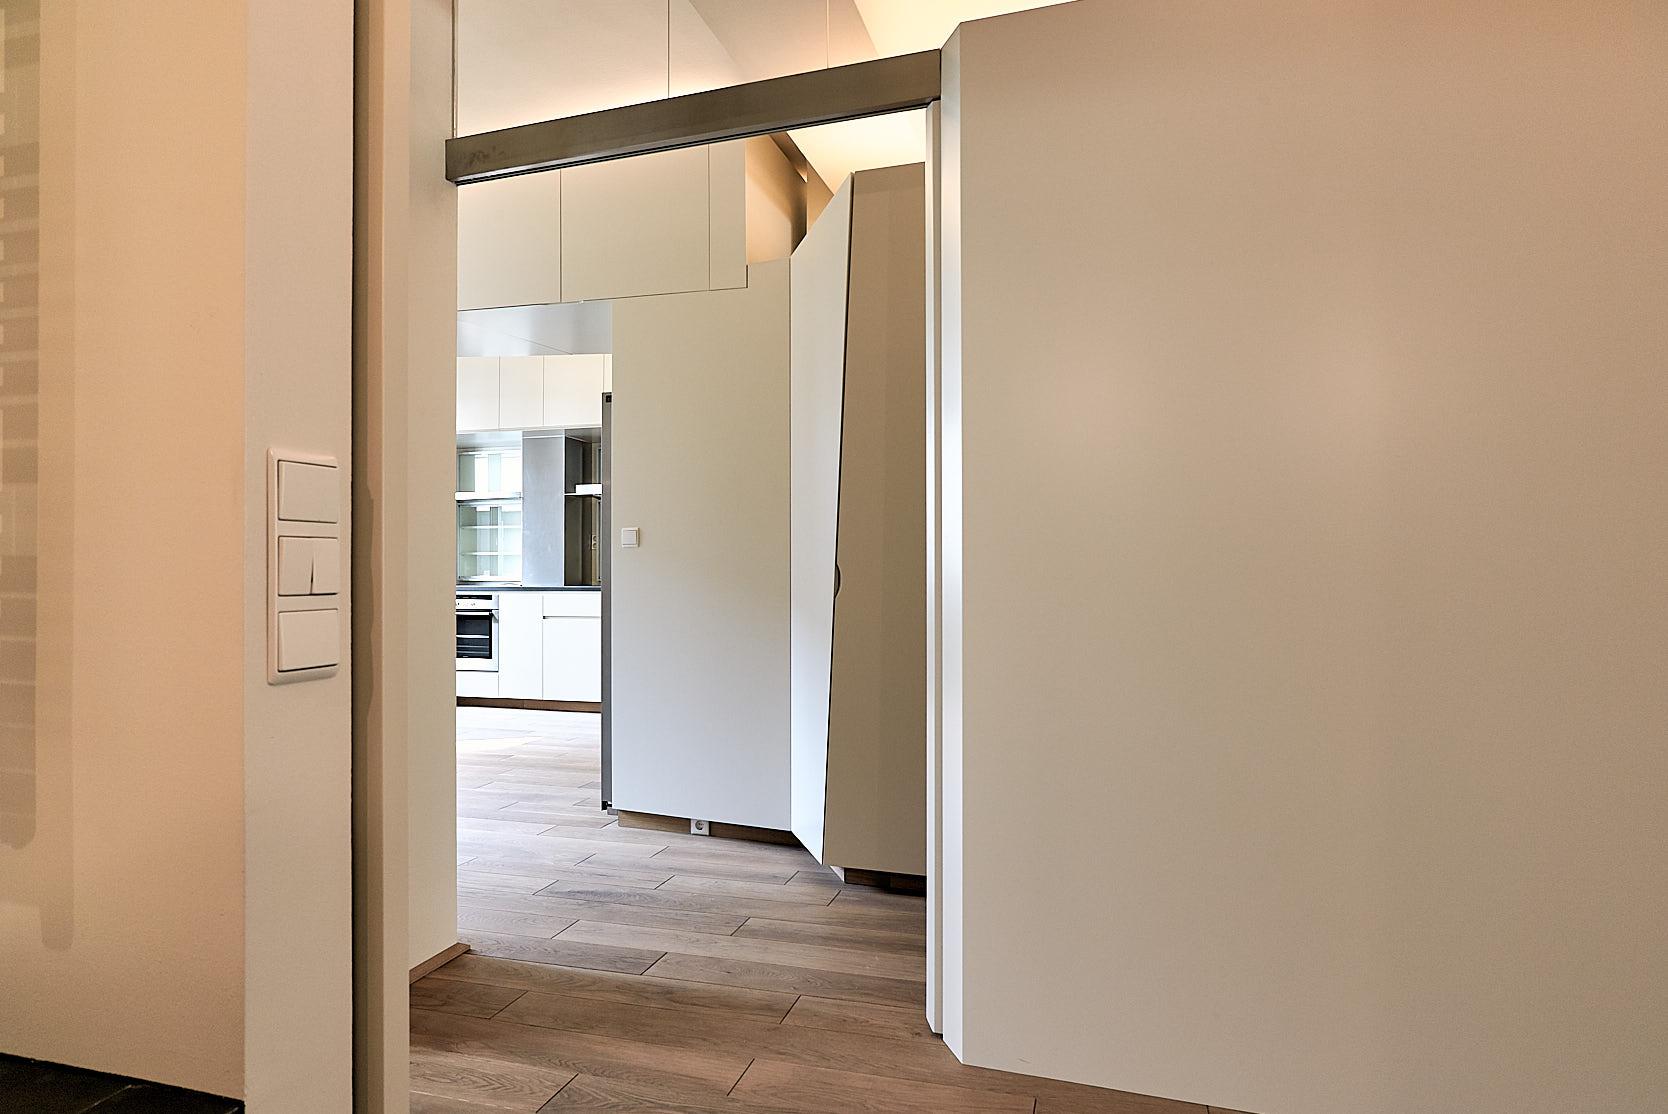 Czerwenka Apartment: Views